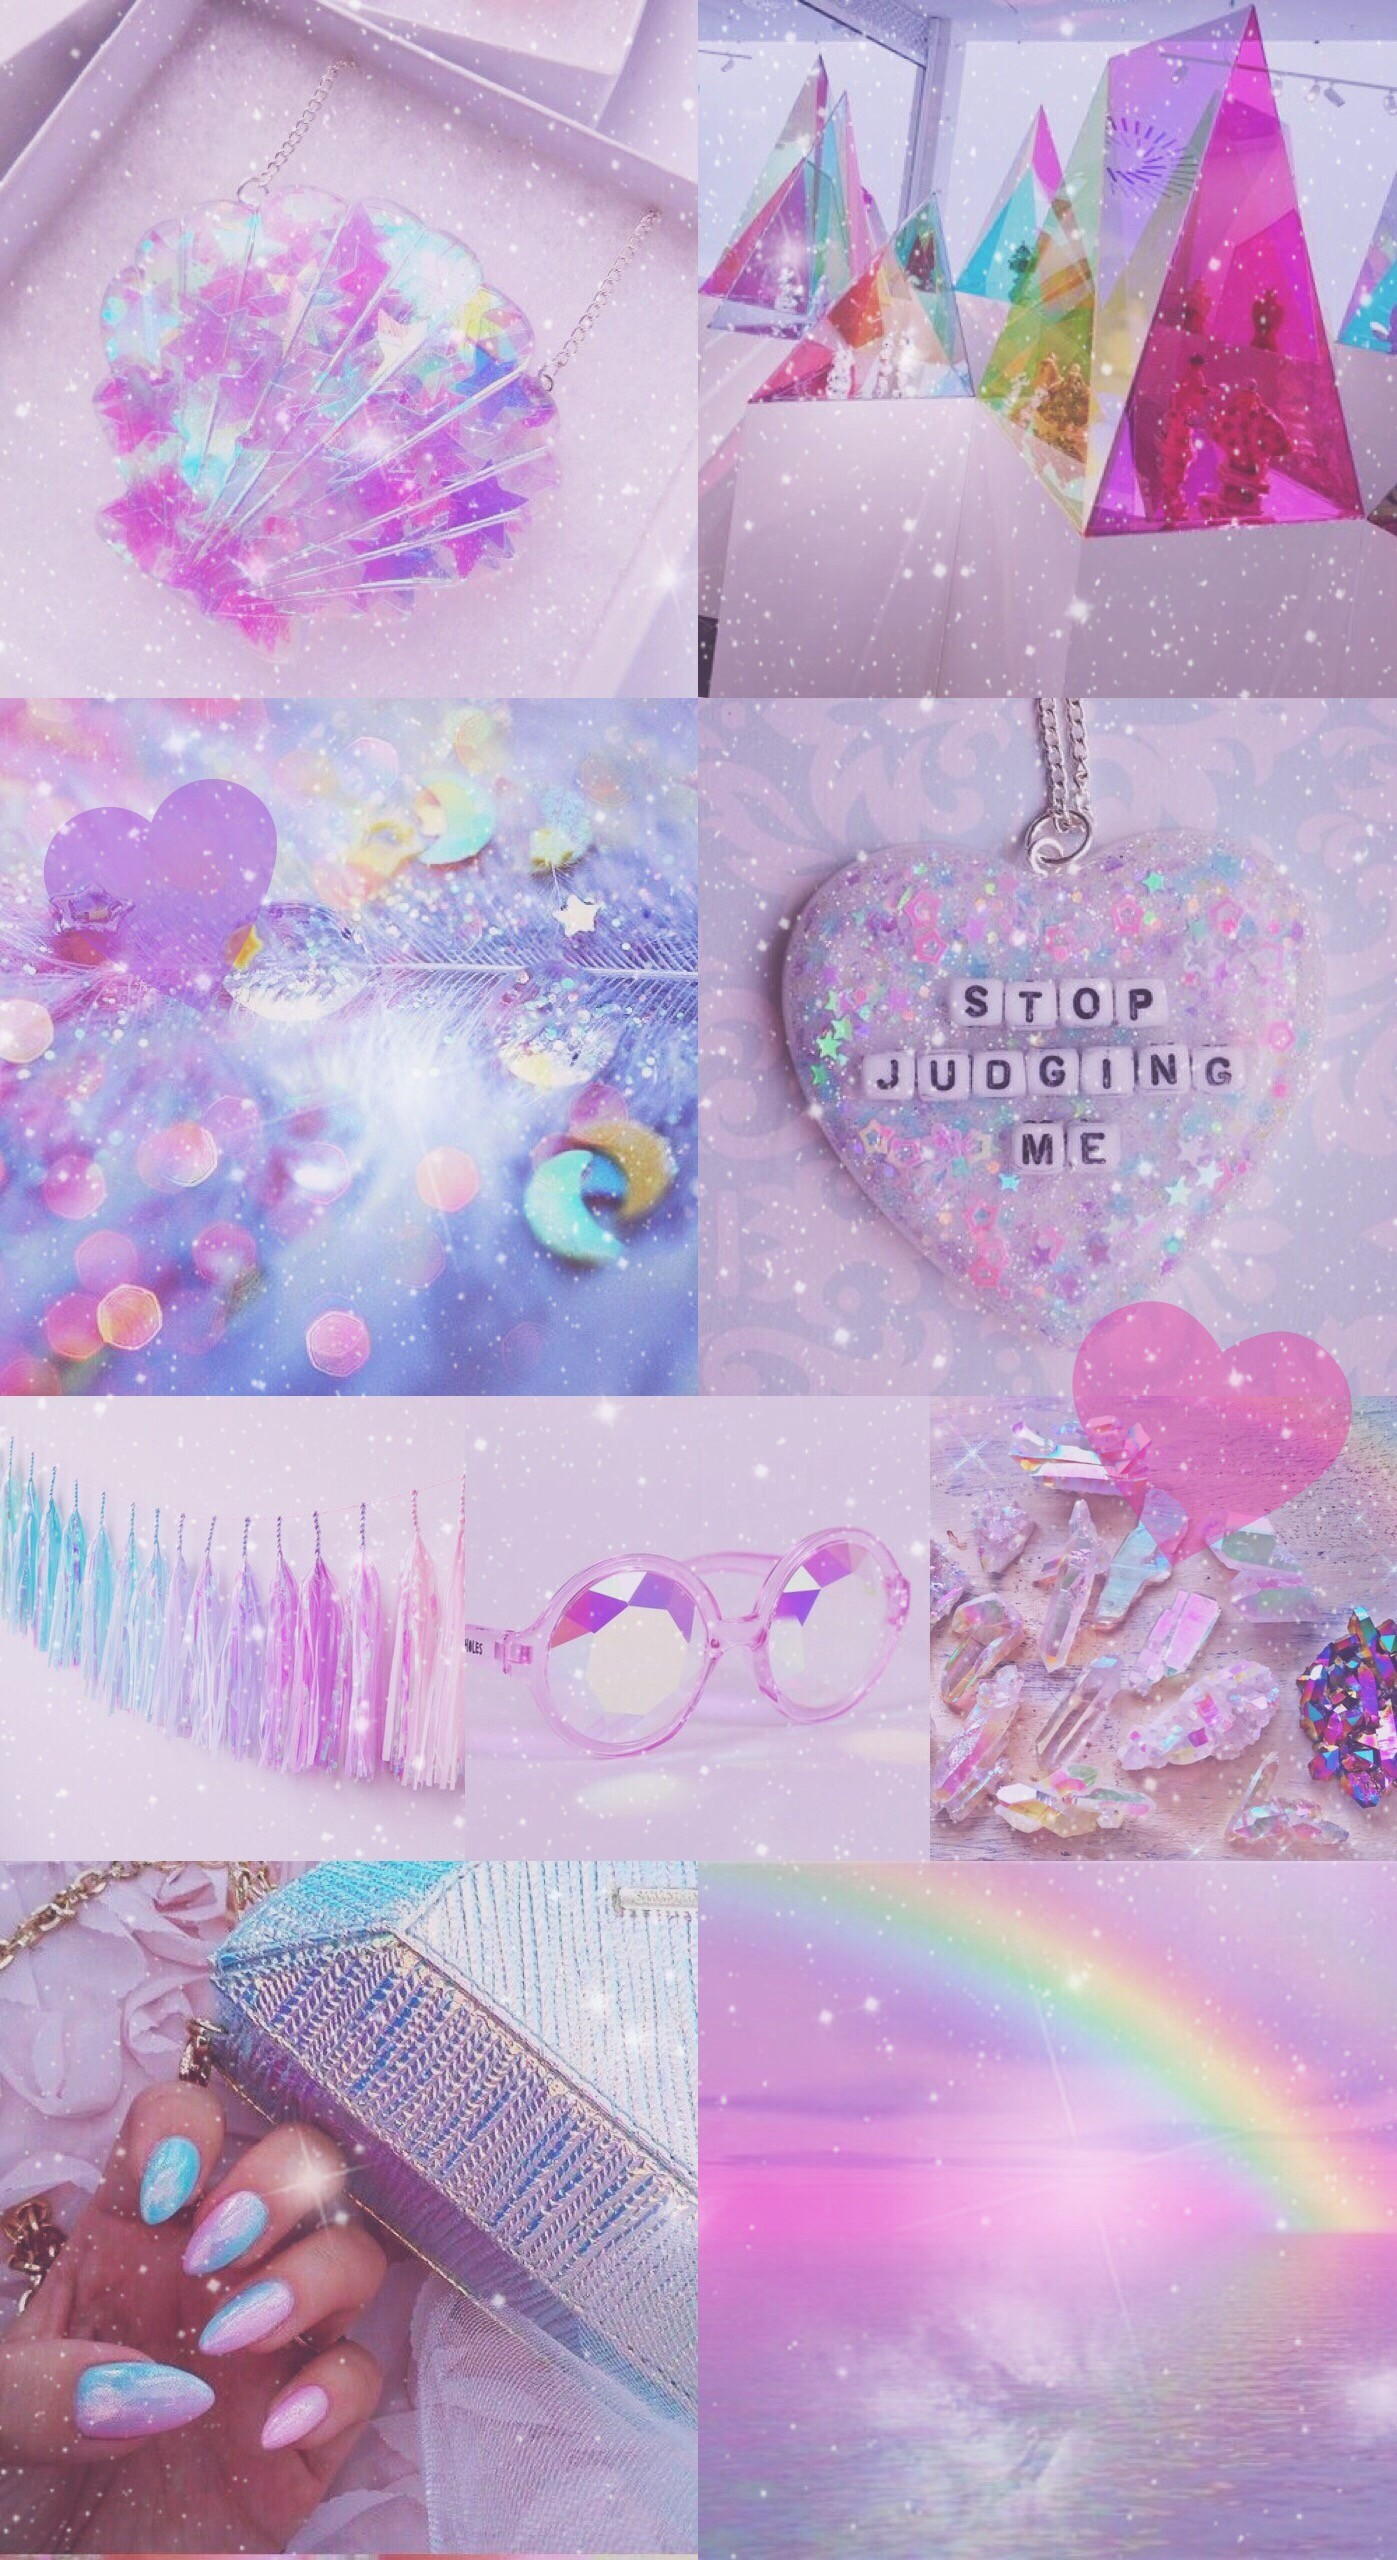 iridescent, wallpaper, background, iPhone, pretty, pink, purple, sparkly,